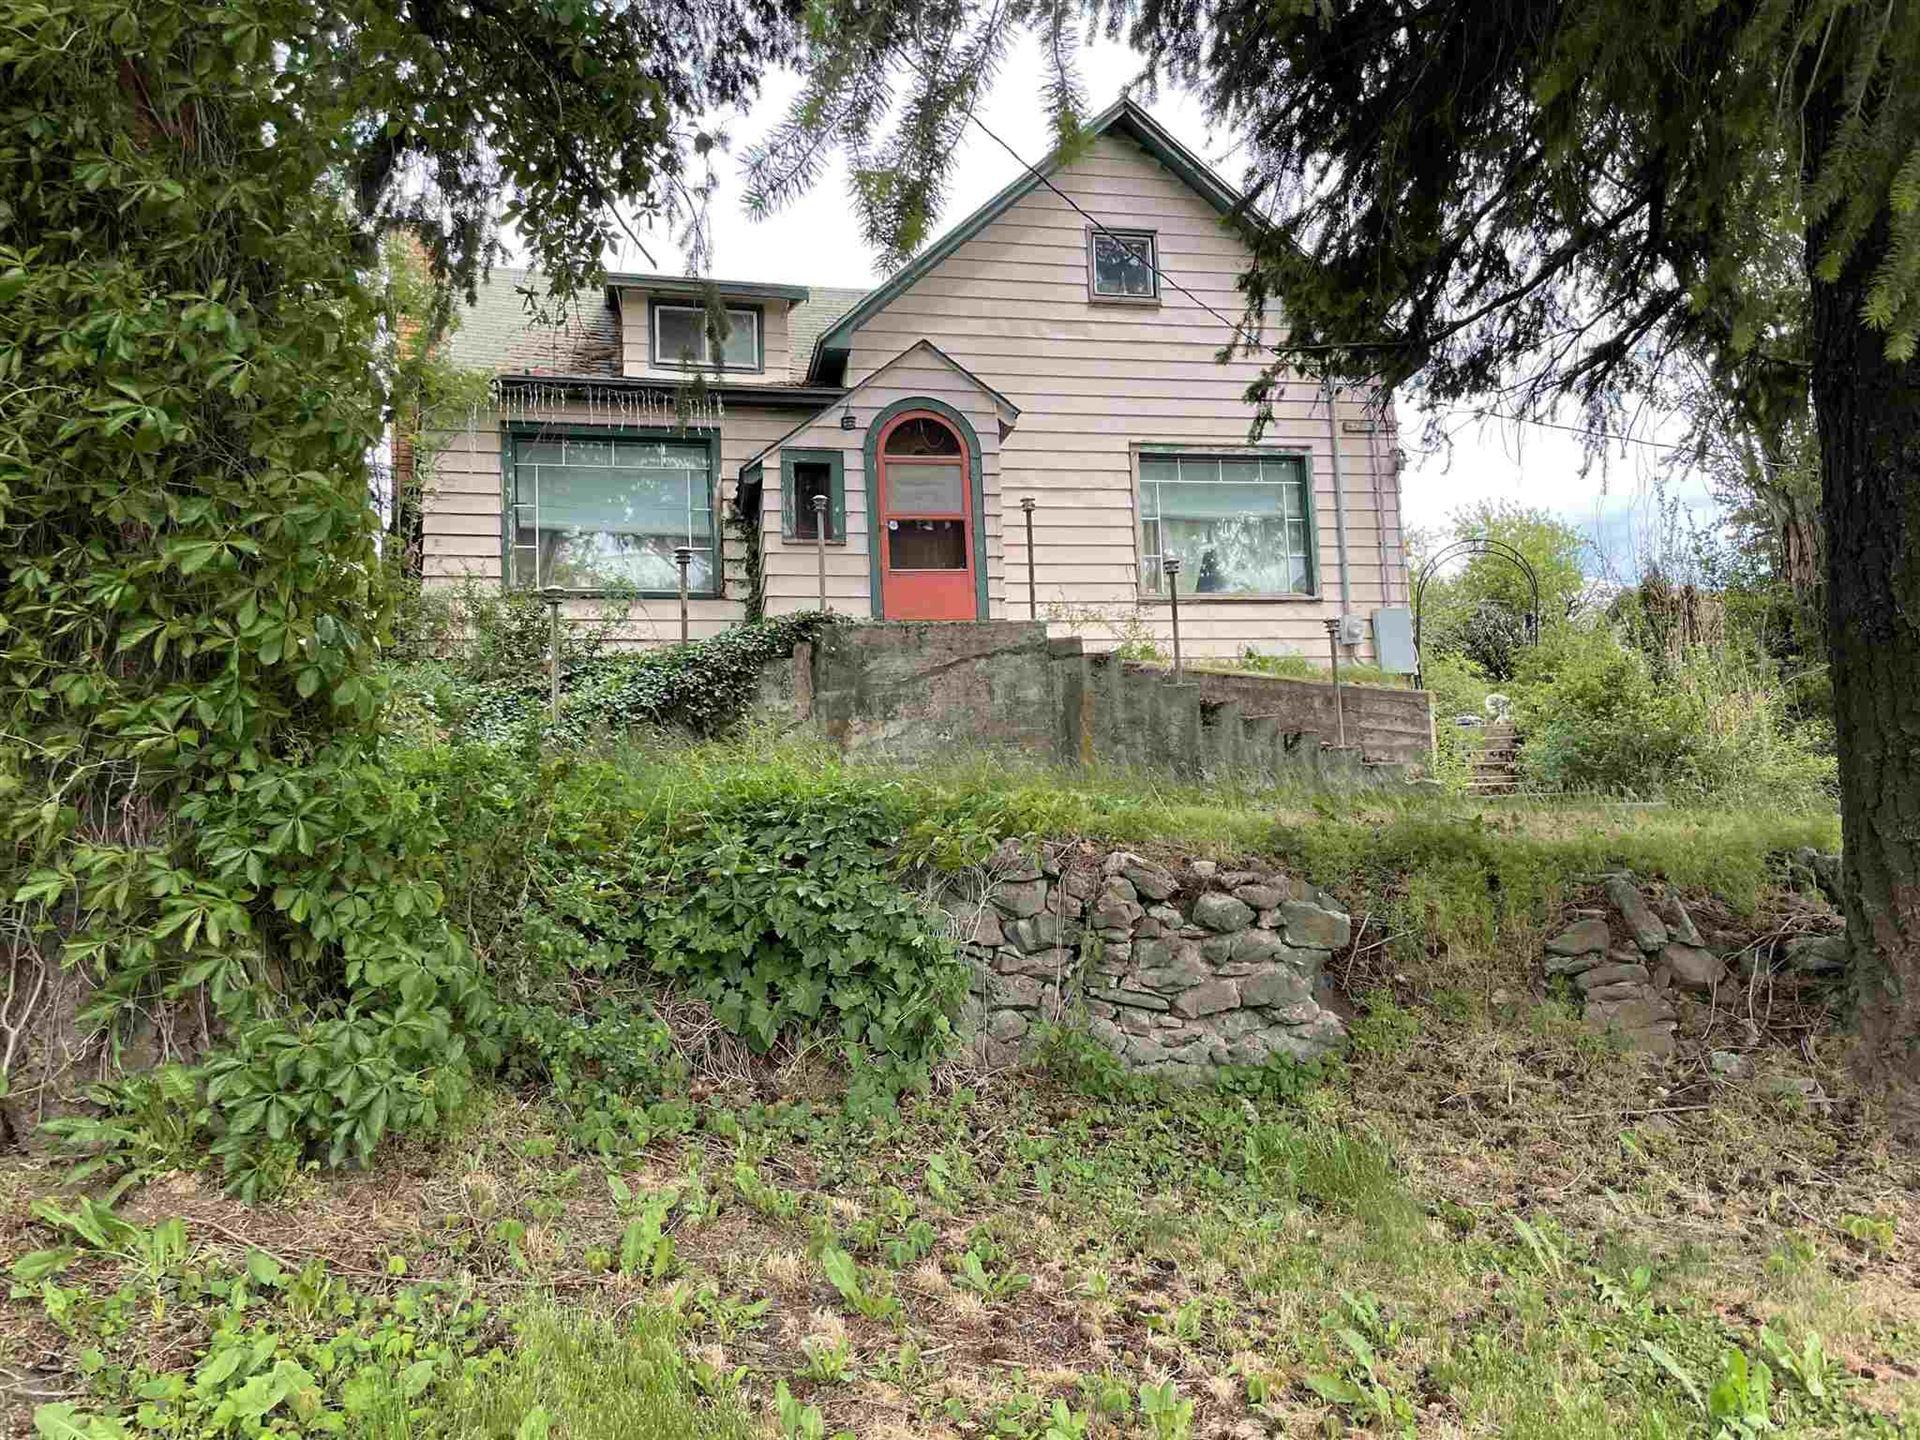 109 N Montana Rd, Oakesdale, WA 99158 - #: 202117225